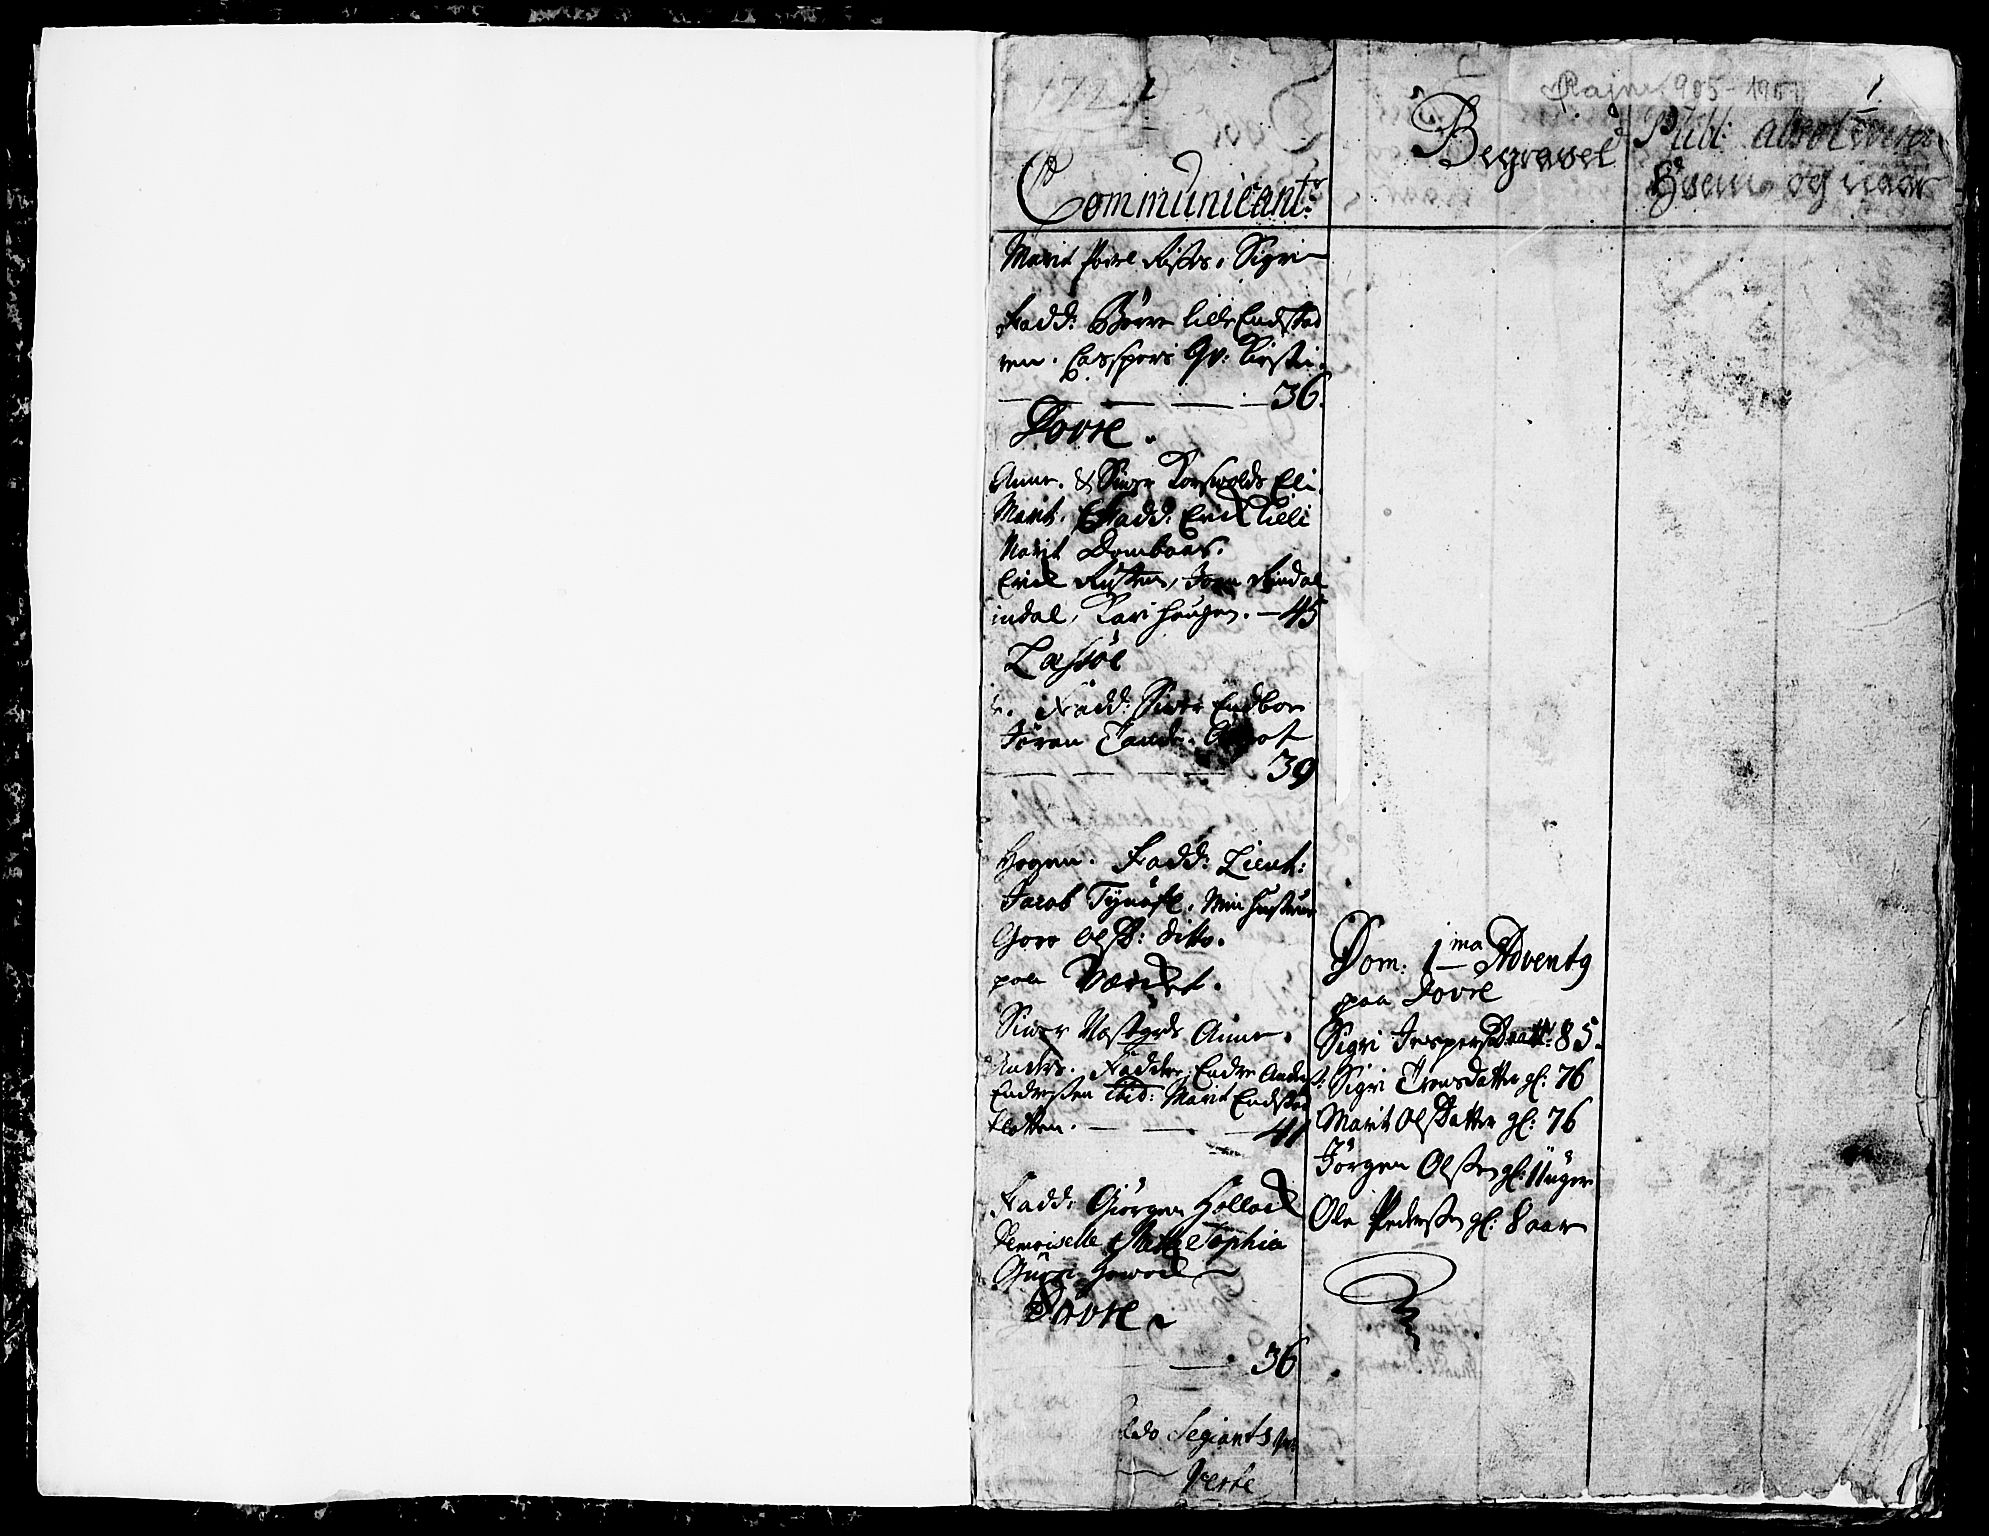 SAH, Lesja prestekontor, Ministerialbok nr. 1, 1724-1731, s. 1